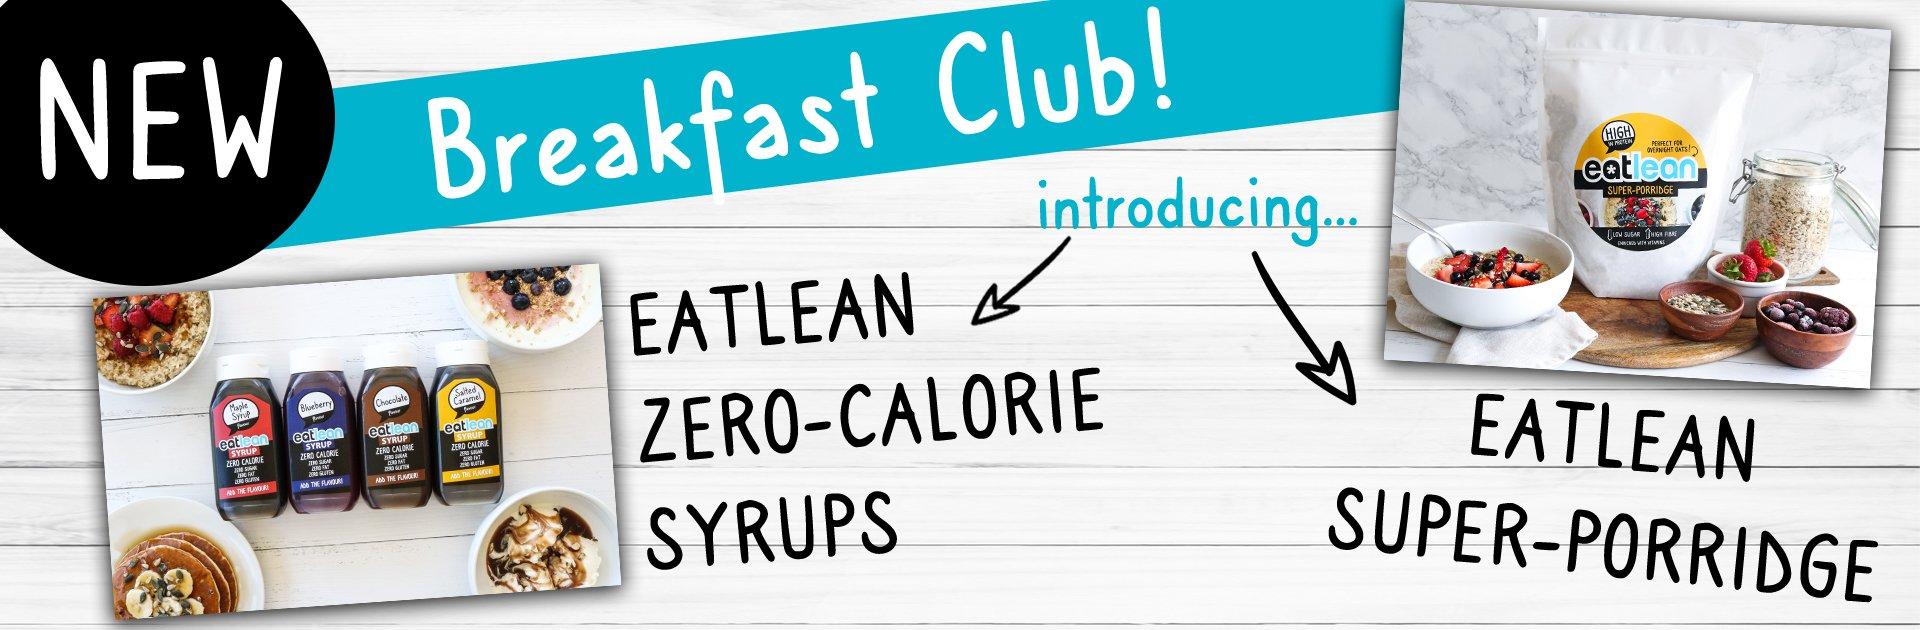 Eatlean Syrups and porridge new